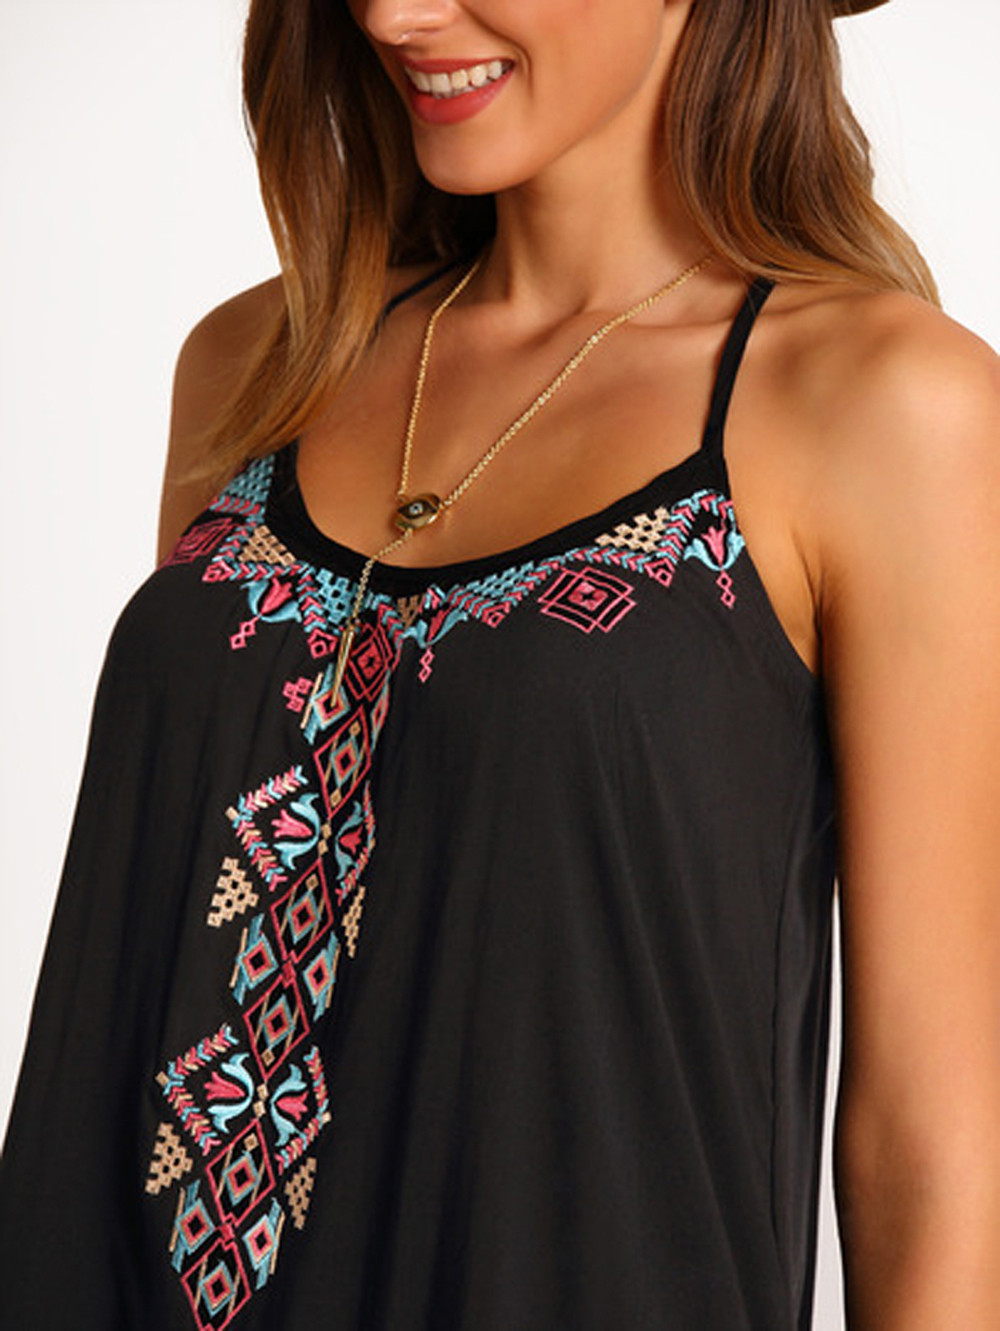 Vintage Boho Sexy Women Summer Casual Printed Dress Fashion Sleeveless Ikeacasa, Free Shipping